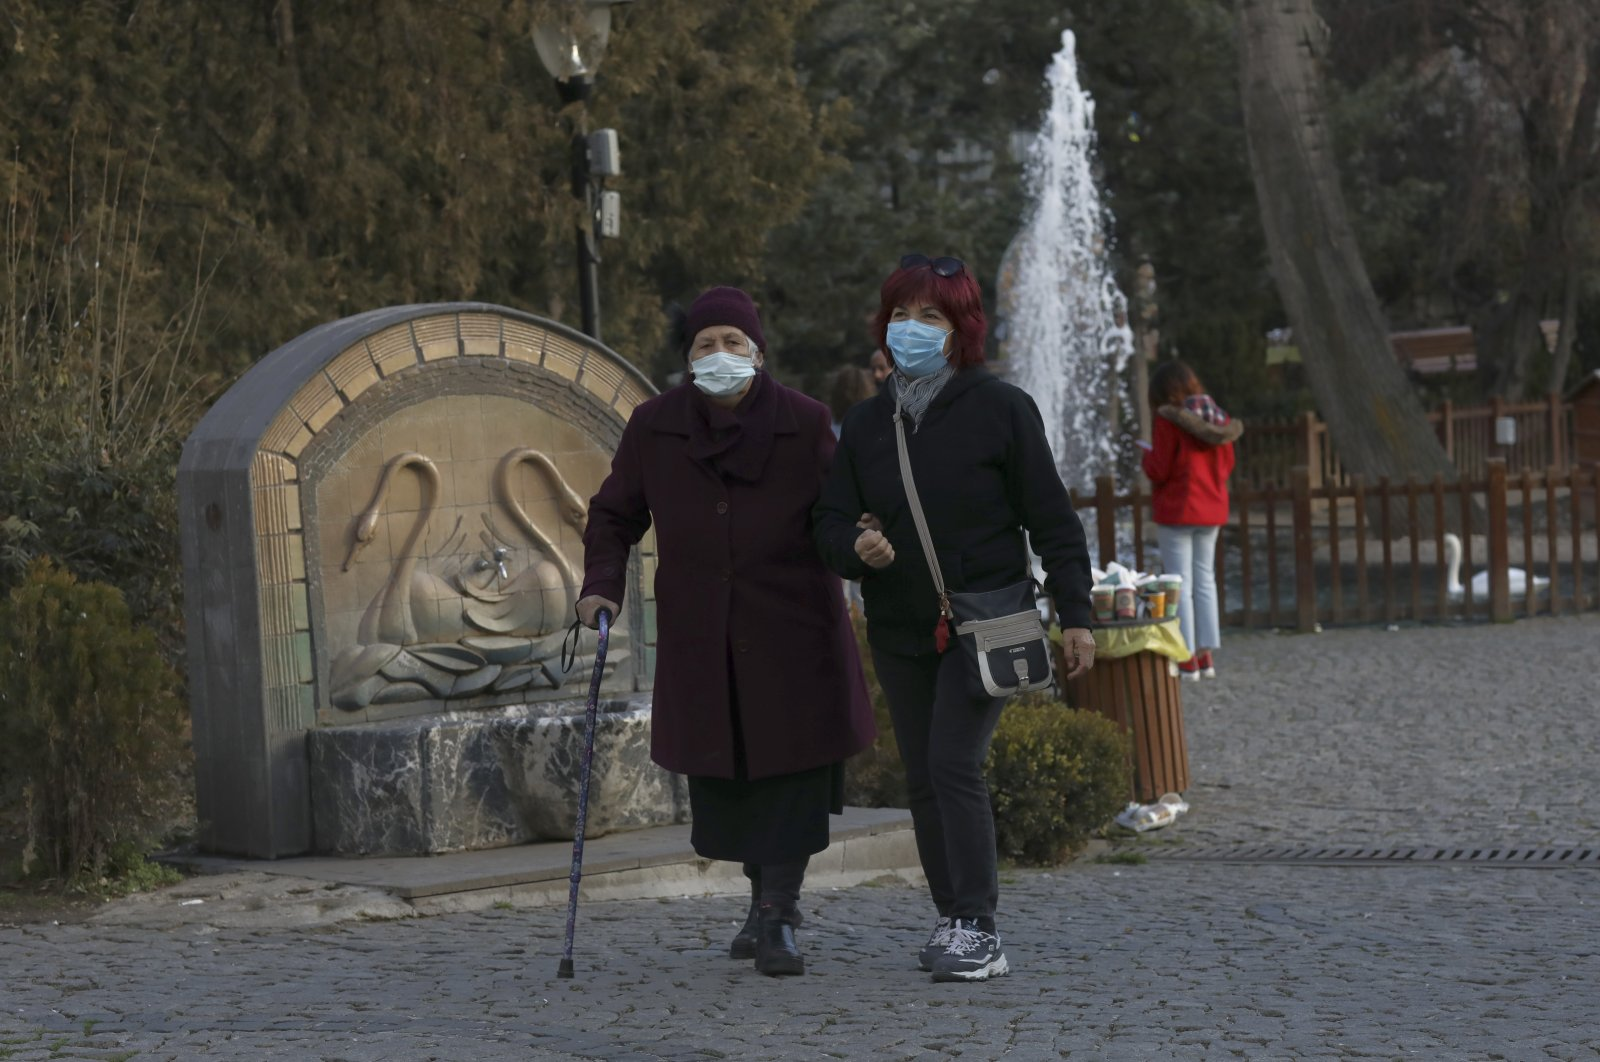 Women wearing face masks walk in a public garden in Ankara, Turkey, Jan. 1, 2021. (AP Photo)